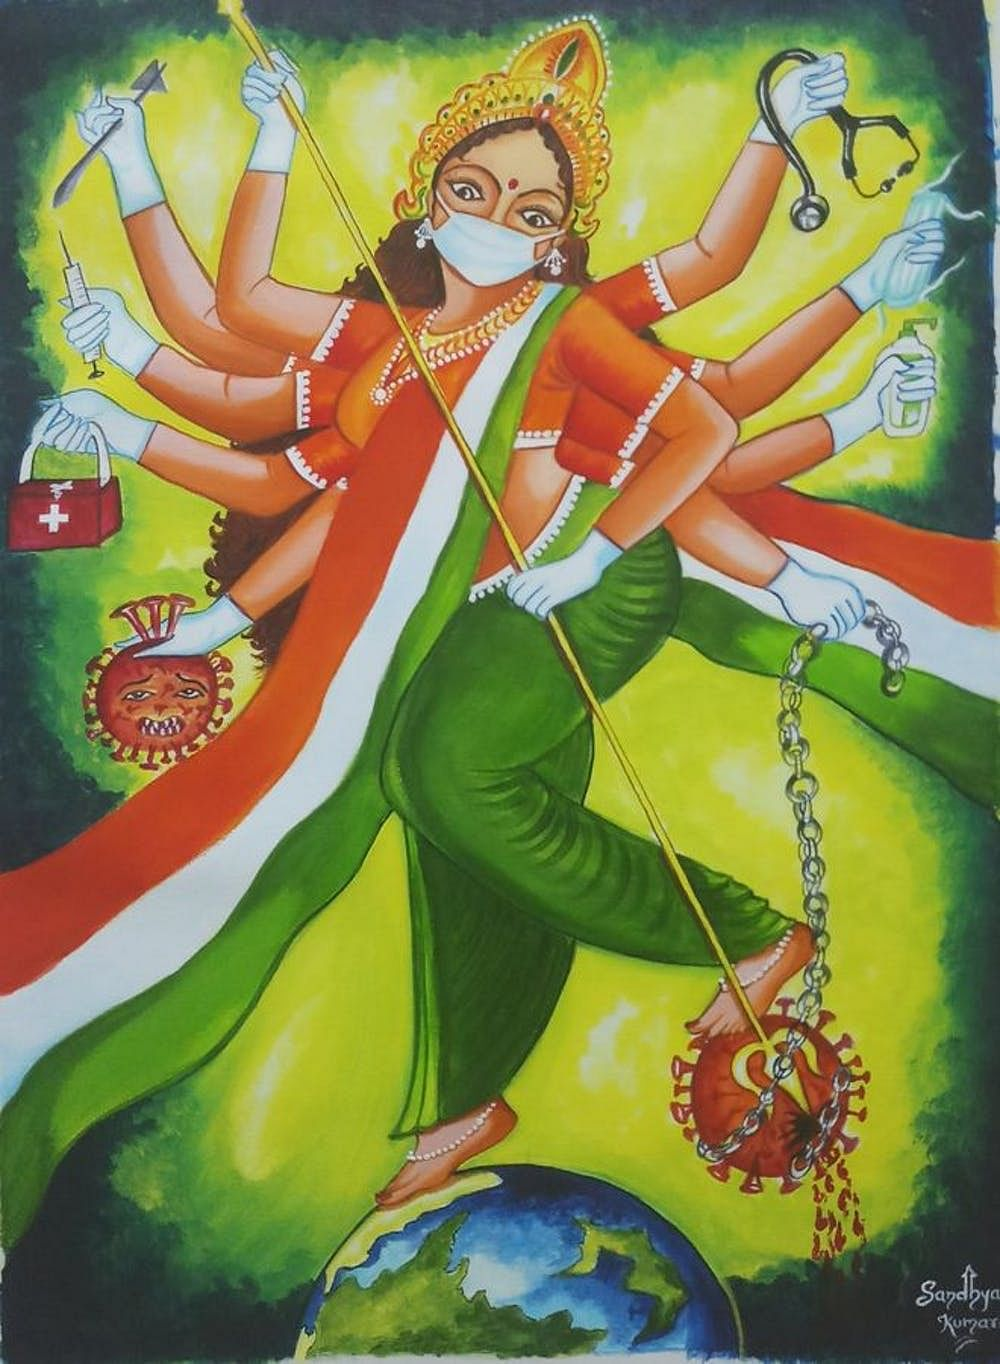 कोरोना वायरस मर्दिनी, संध्या कुमारी, Gallerist.in